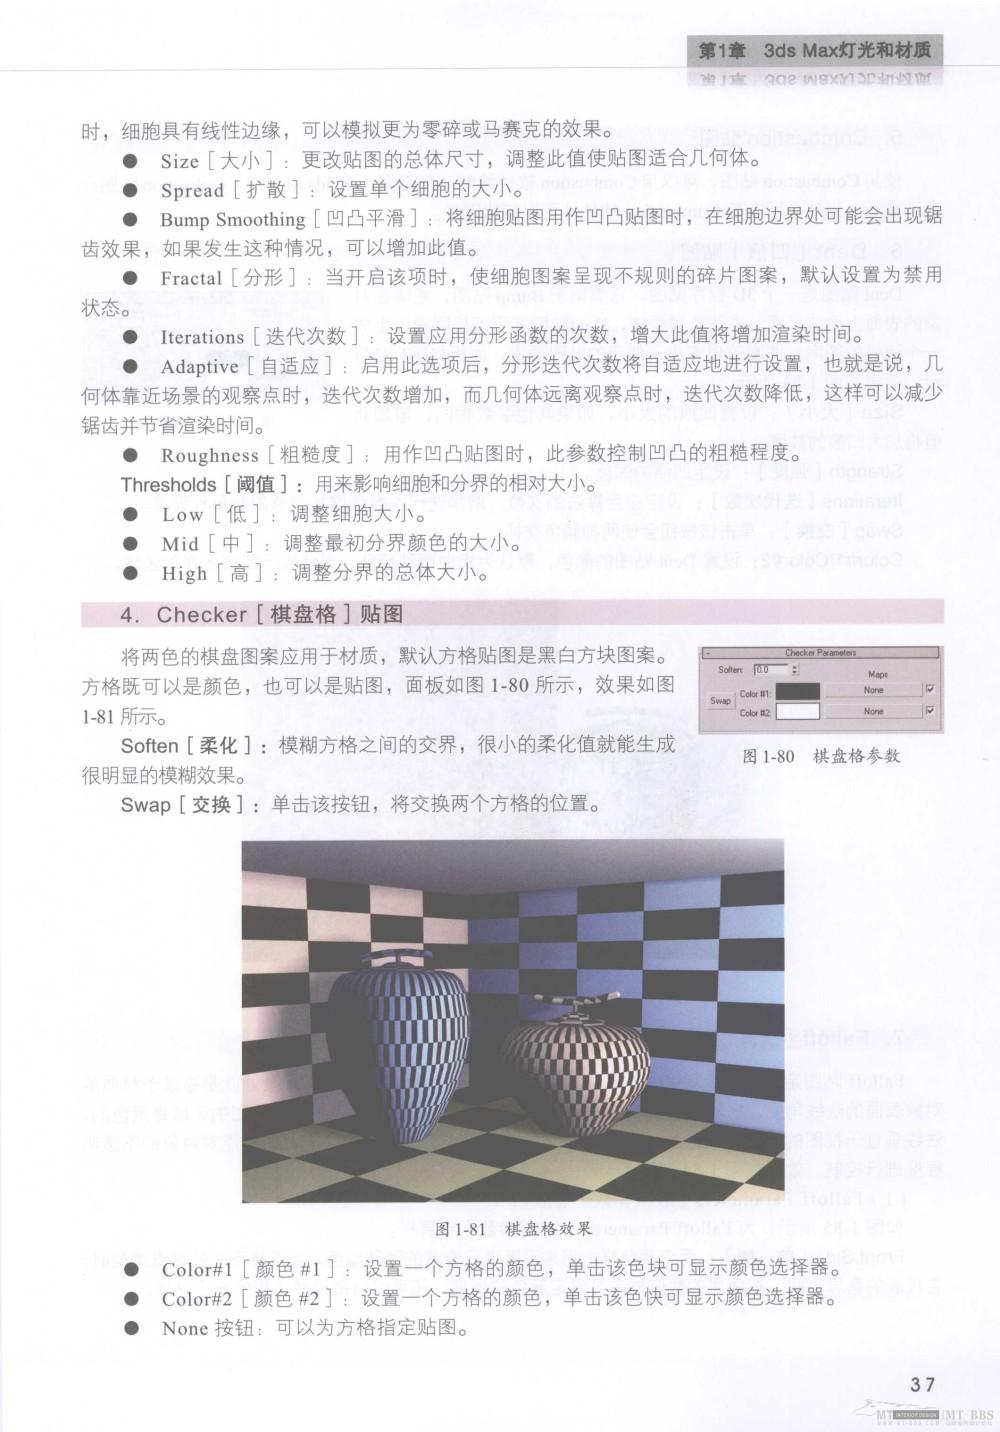 水晶石技法-3ds_Max&VRay室内空间表现_水晶石技法-3ds_Max&VRay室内空间表现_页面_043.jpg